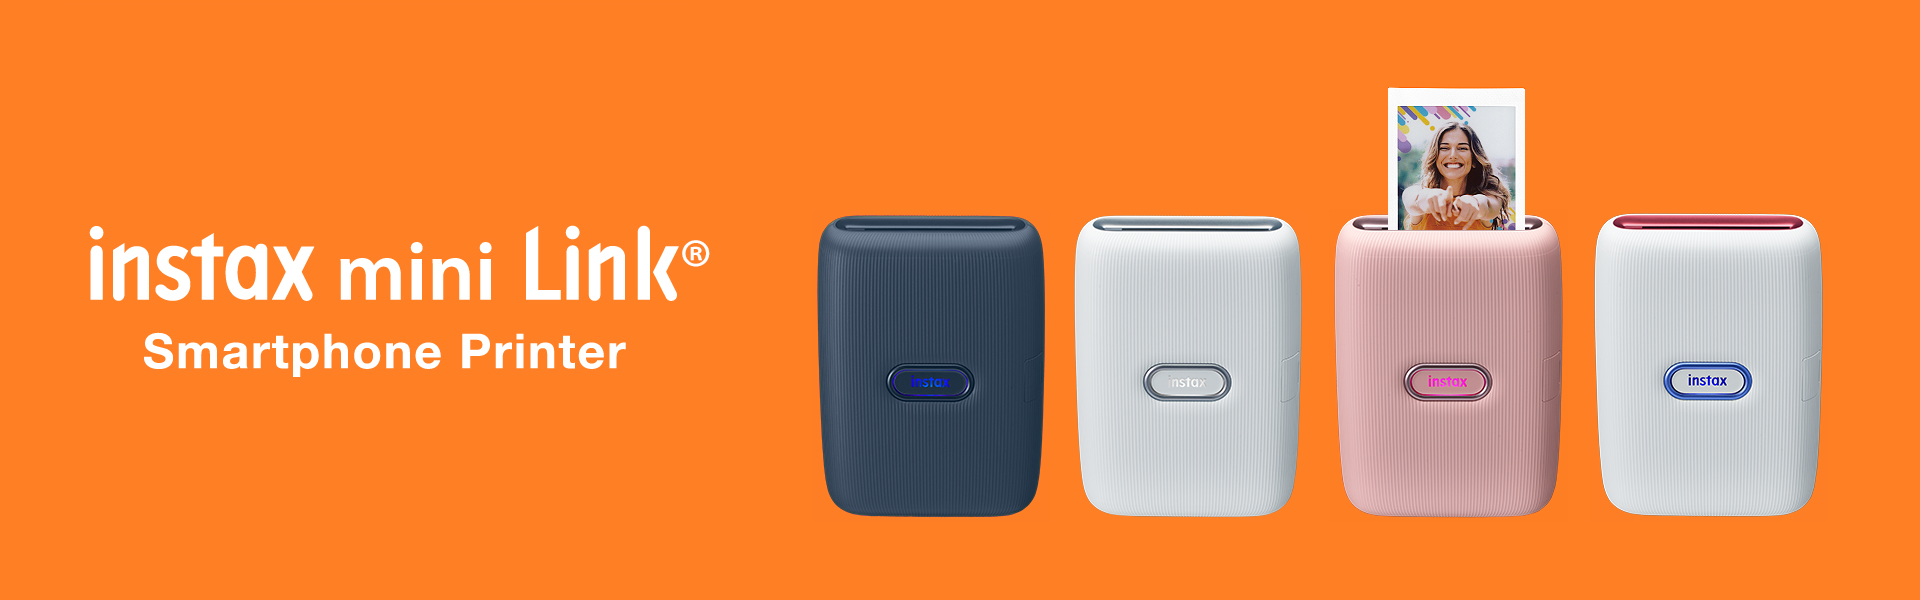 Orange Hero image with three MINI LINK printers